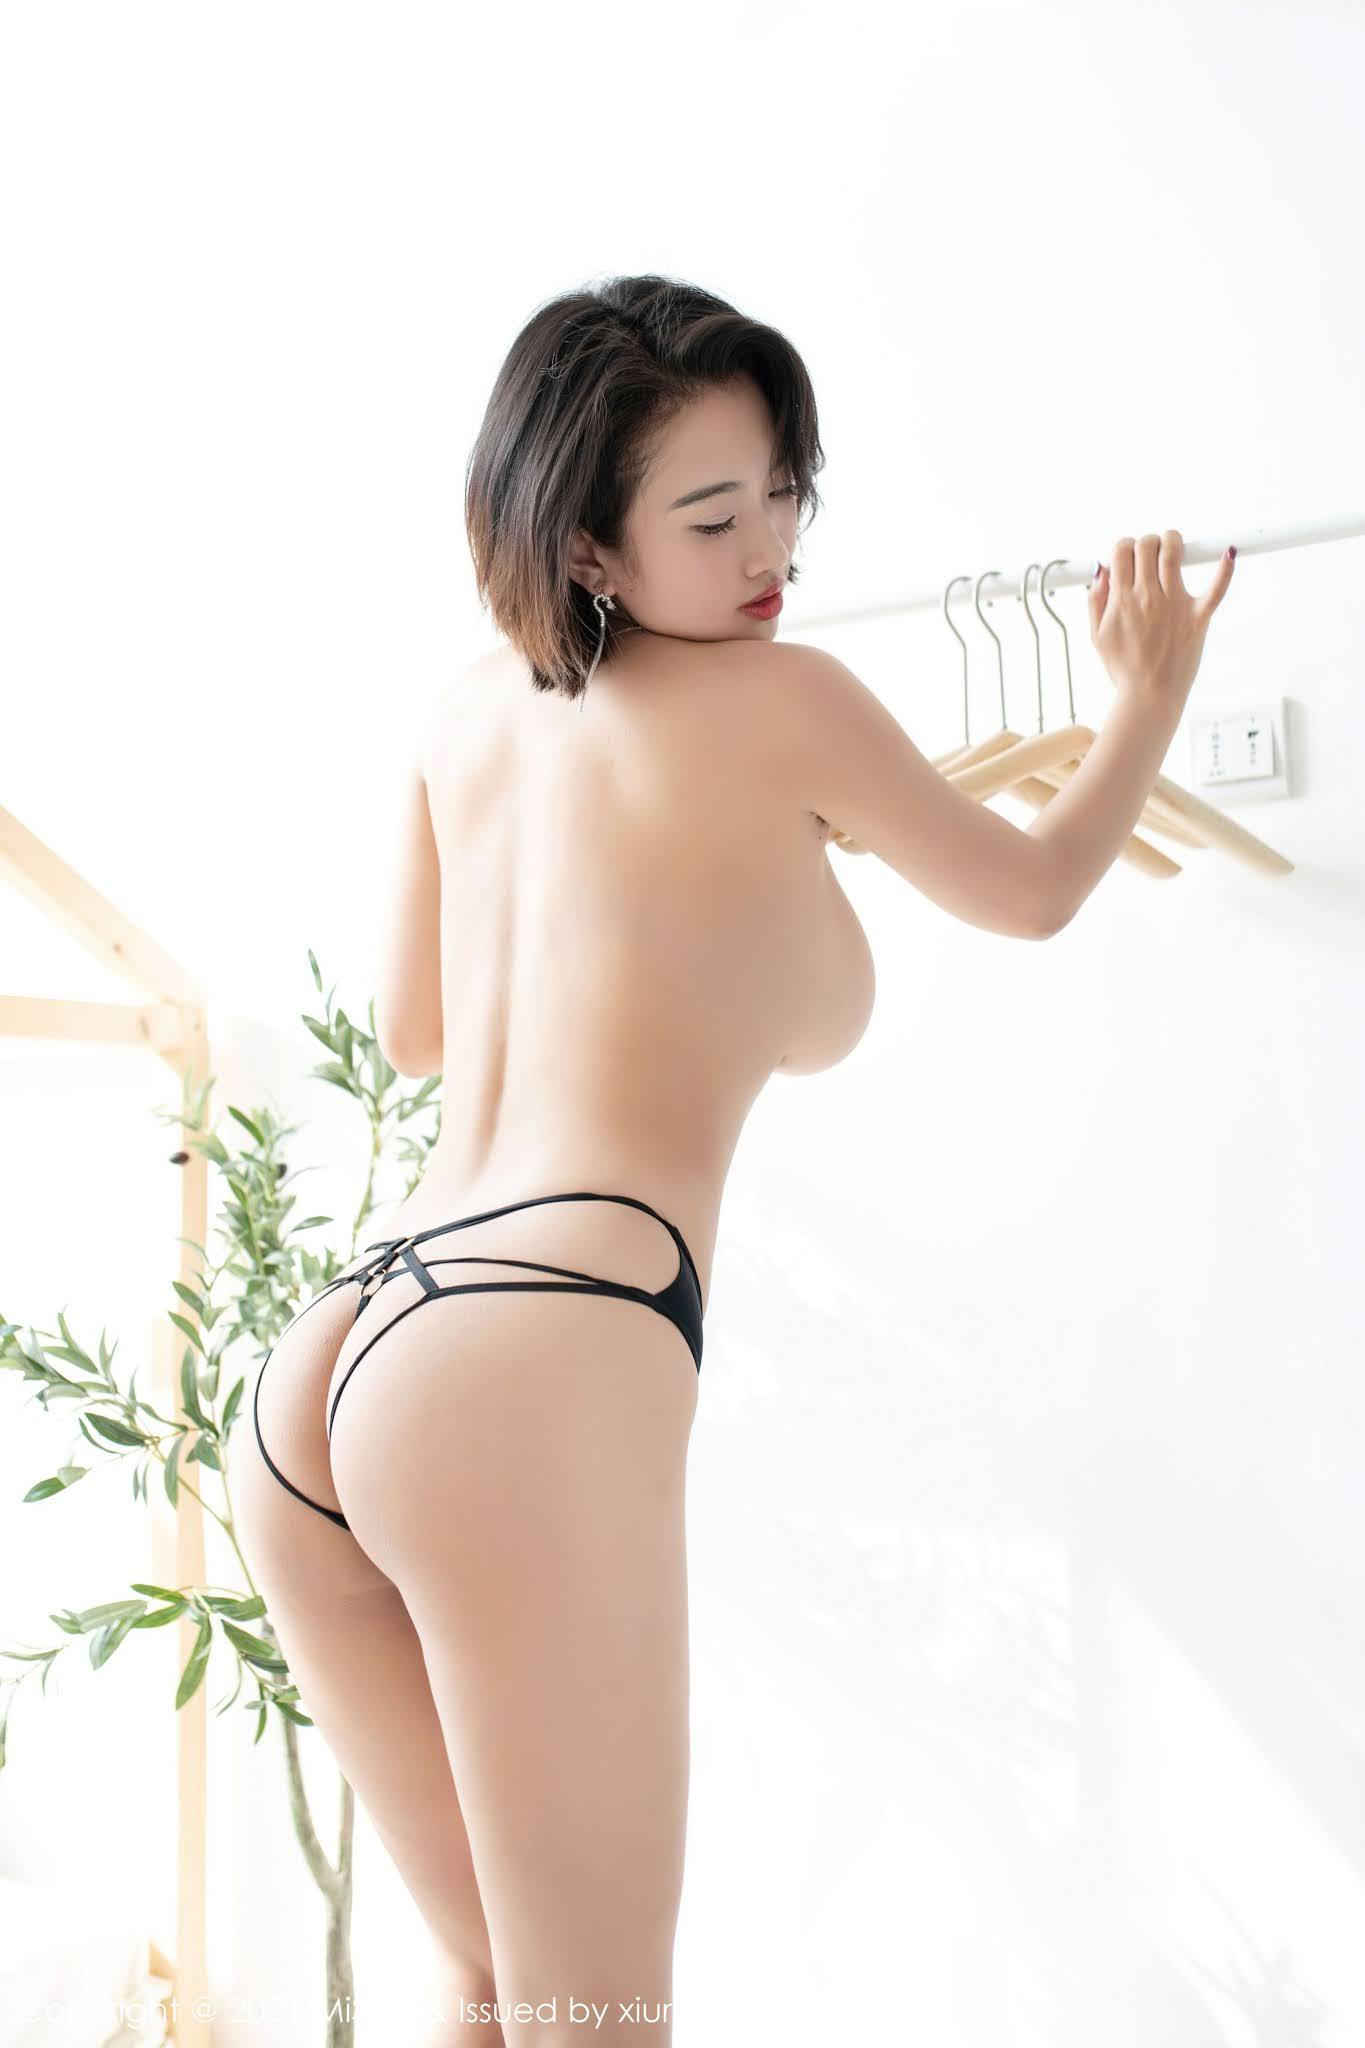 MiStar-Vol.327-Wu-Mei-Xin-Superbeautygirlx.com